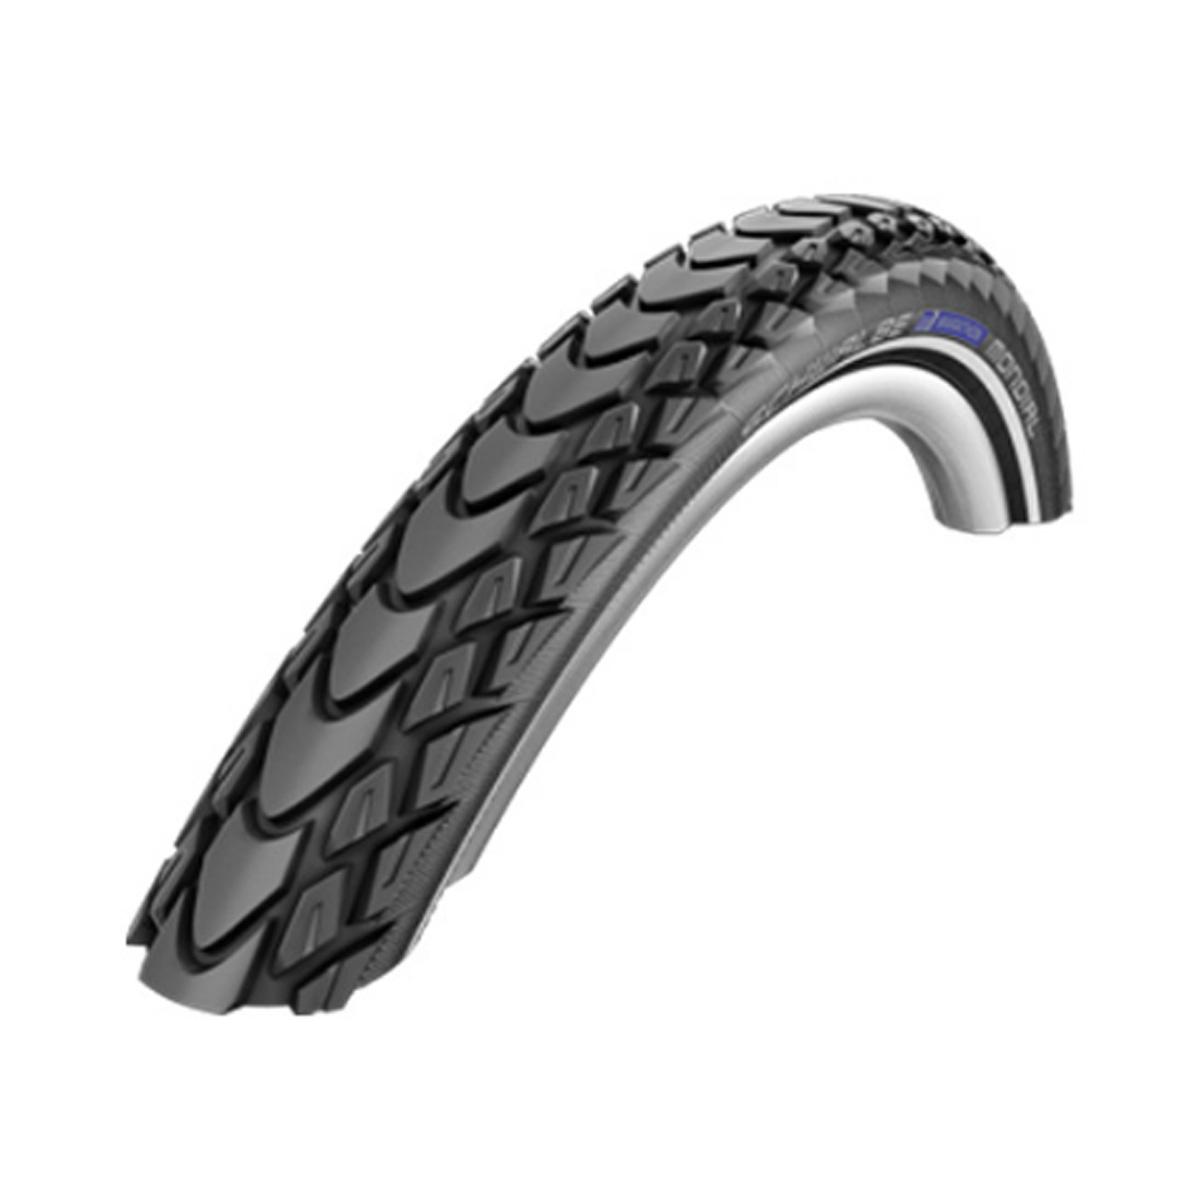 Schwalbe Marathon Mondial HS 428 RaceGuard City/Touring Bicycle Tire - Wire Bead - Black-Reflex